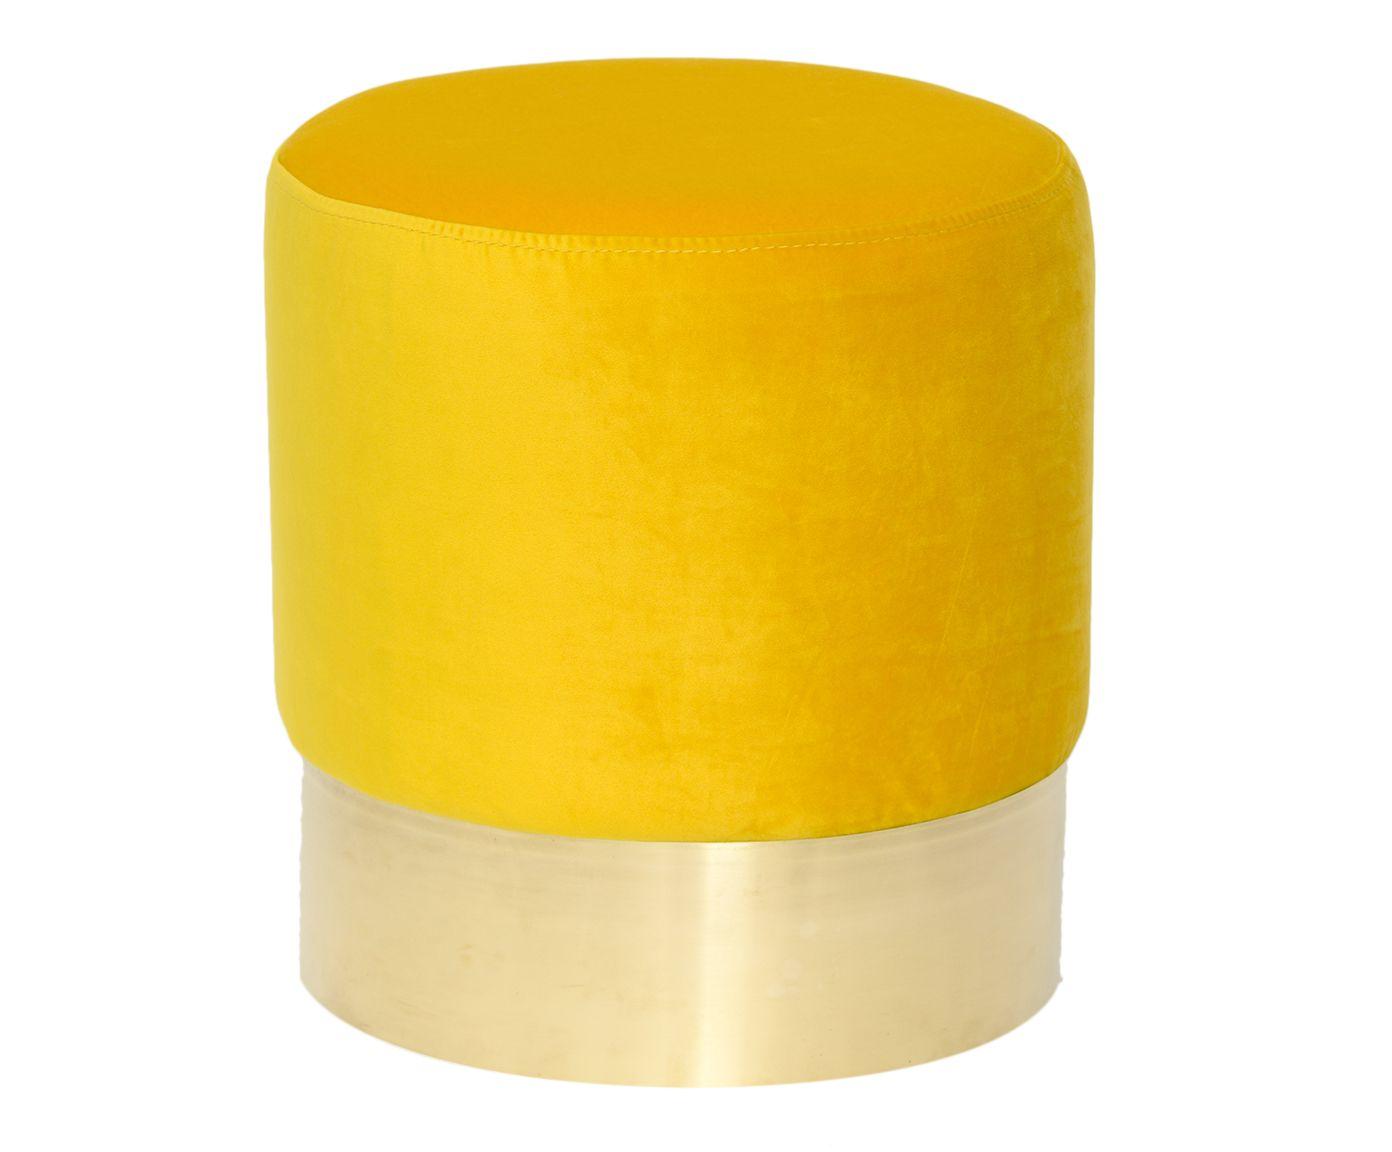 Pufe em Veludo Harlow Amarelo - 38cm | Westwing.com.br